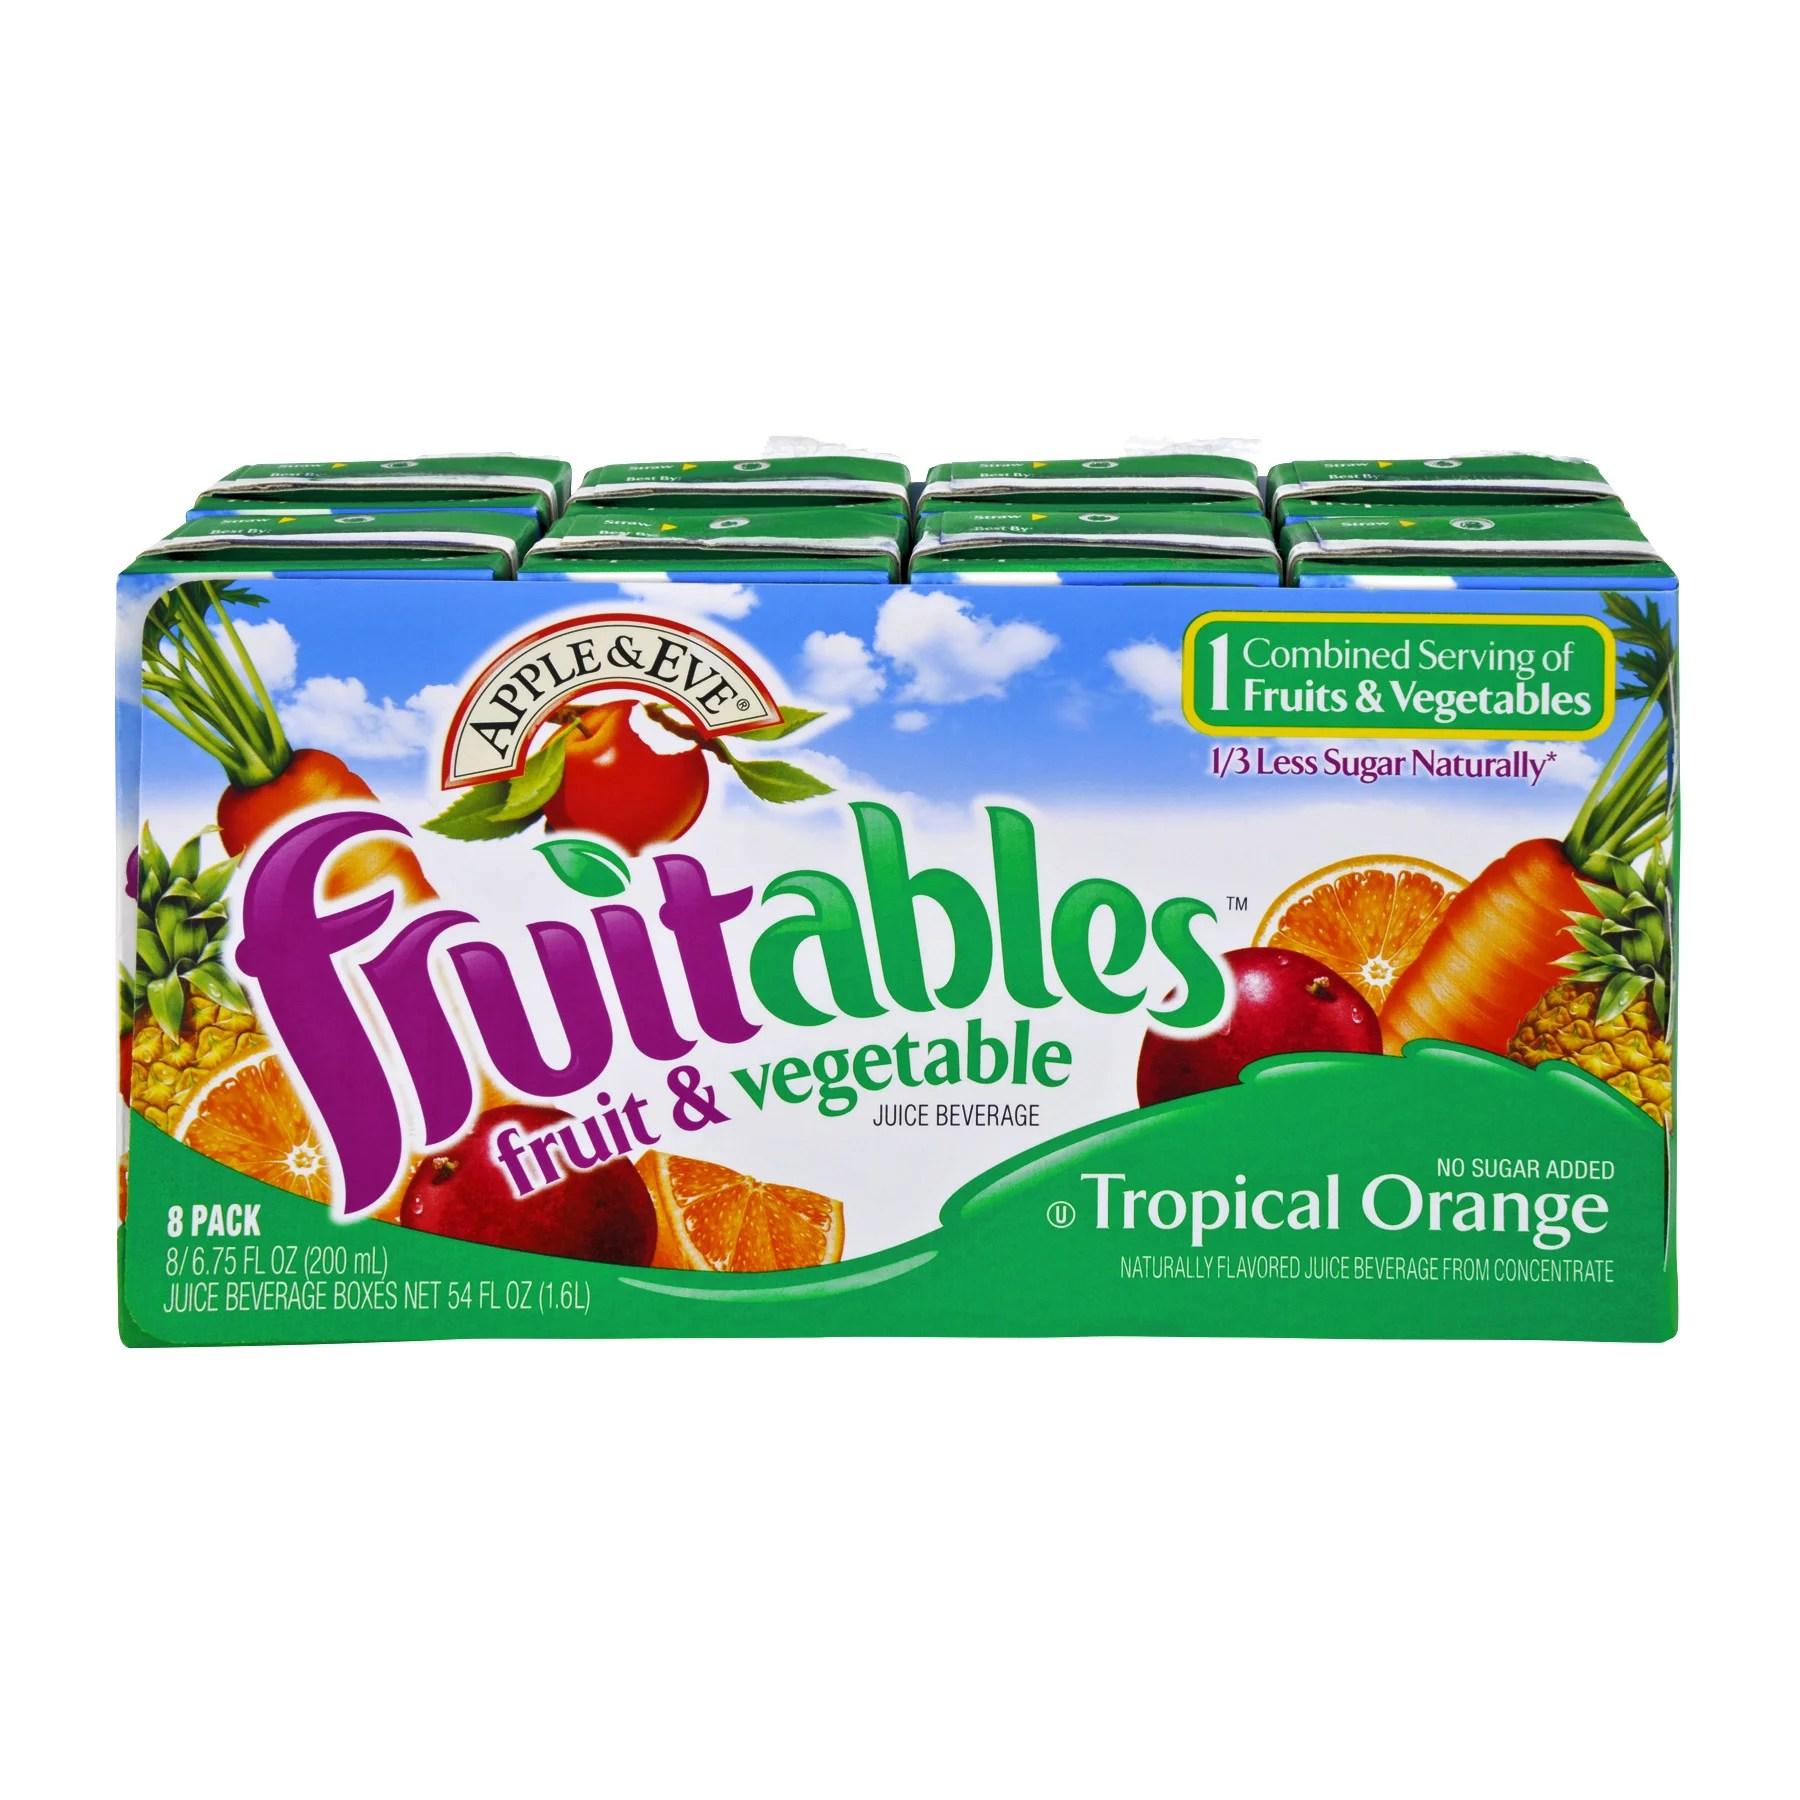 Apple Eve Fruitables Fruits Vegetables Tropical